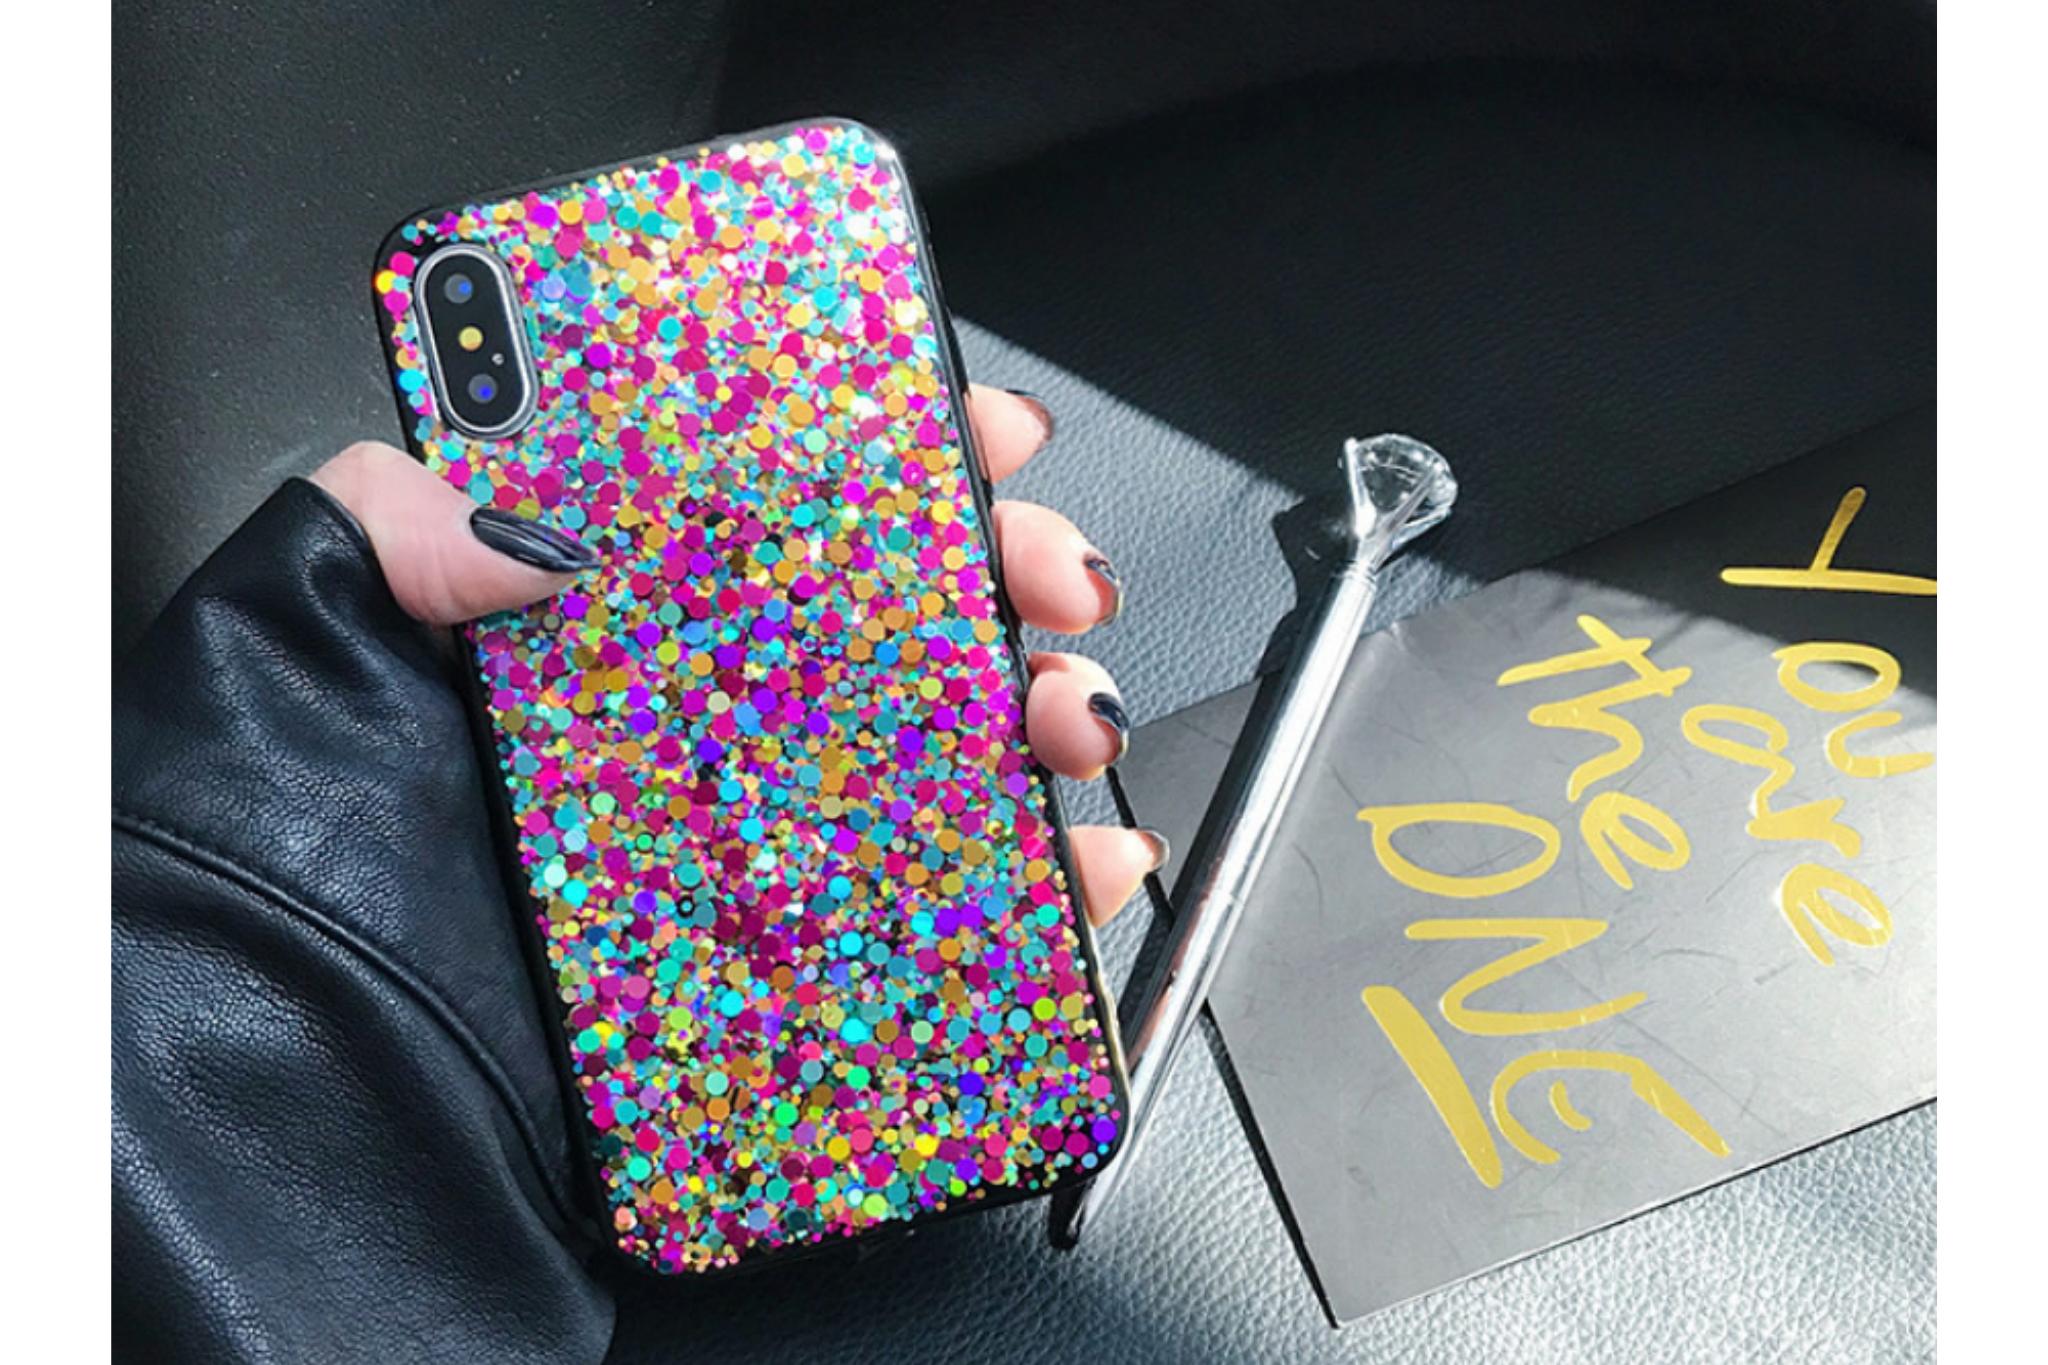 Smartphonehoesje iPhone 11 Pro Max | Bling met glitter | Multicolor